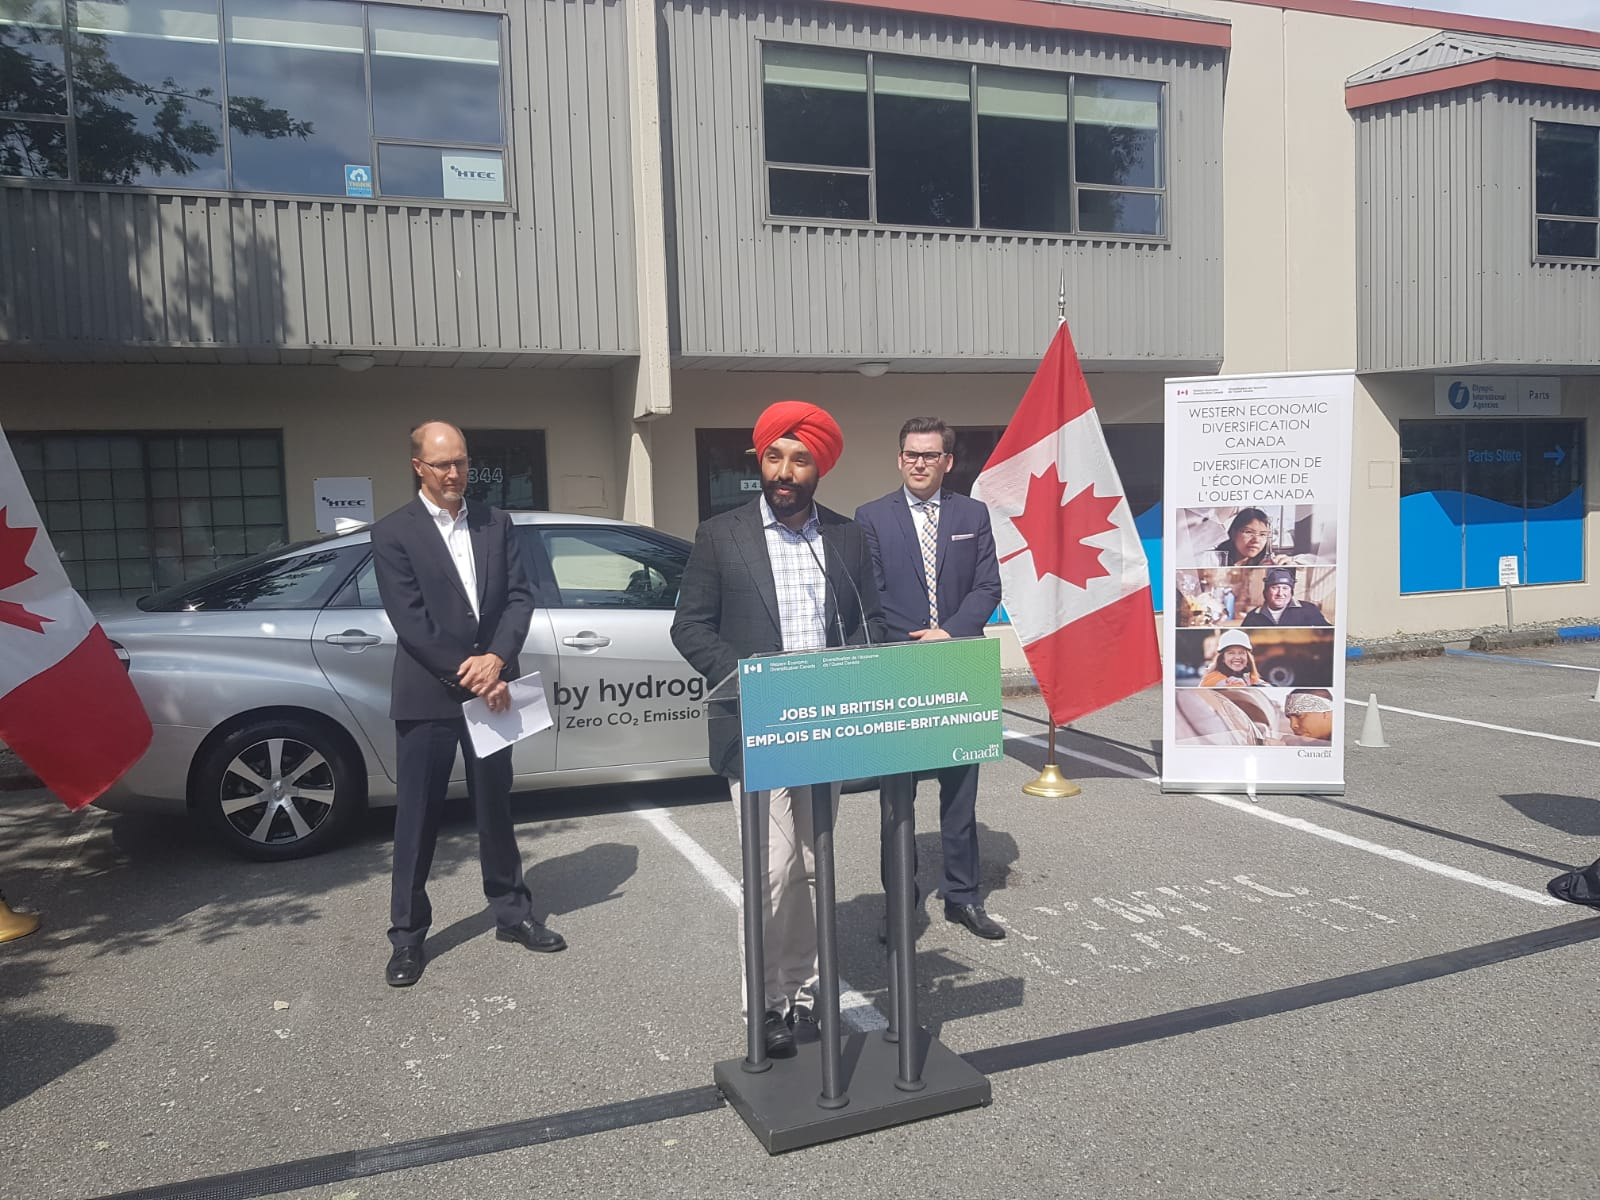 Minister Bains announces funding